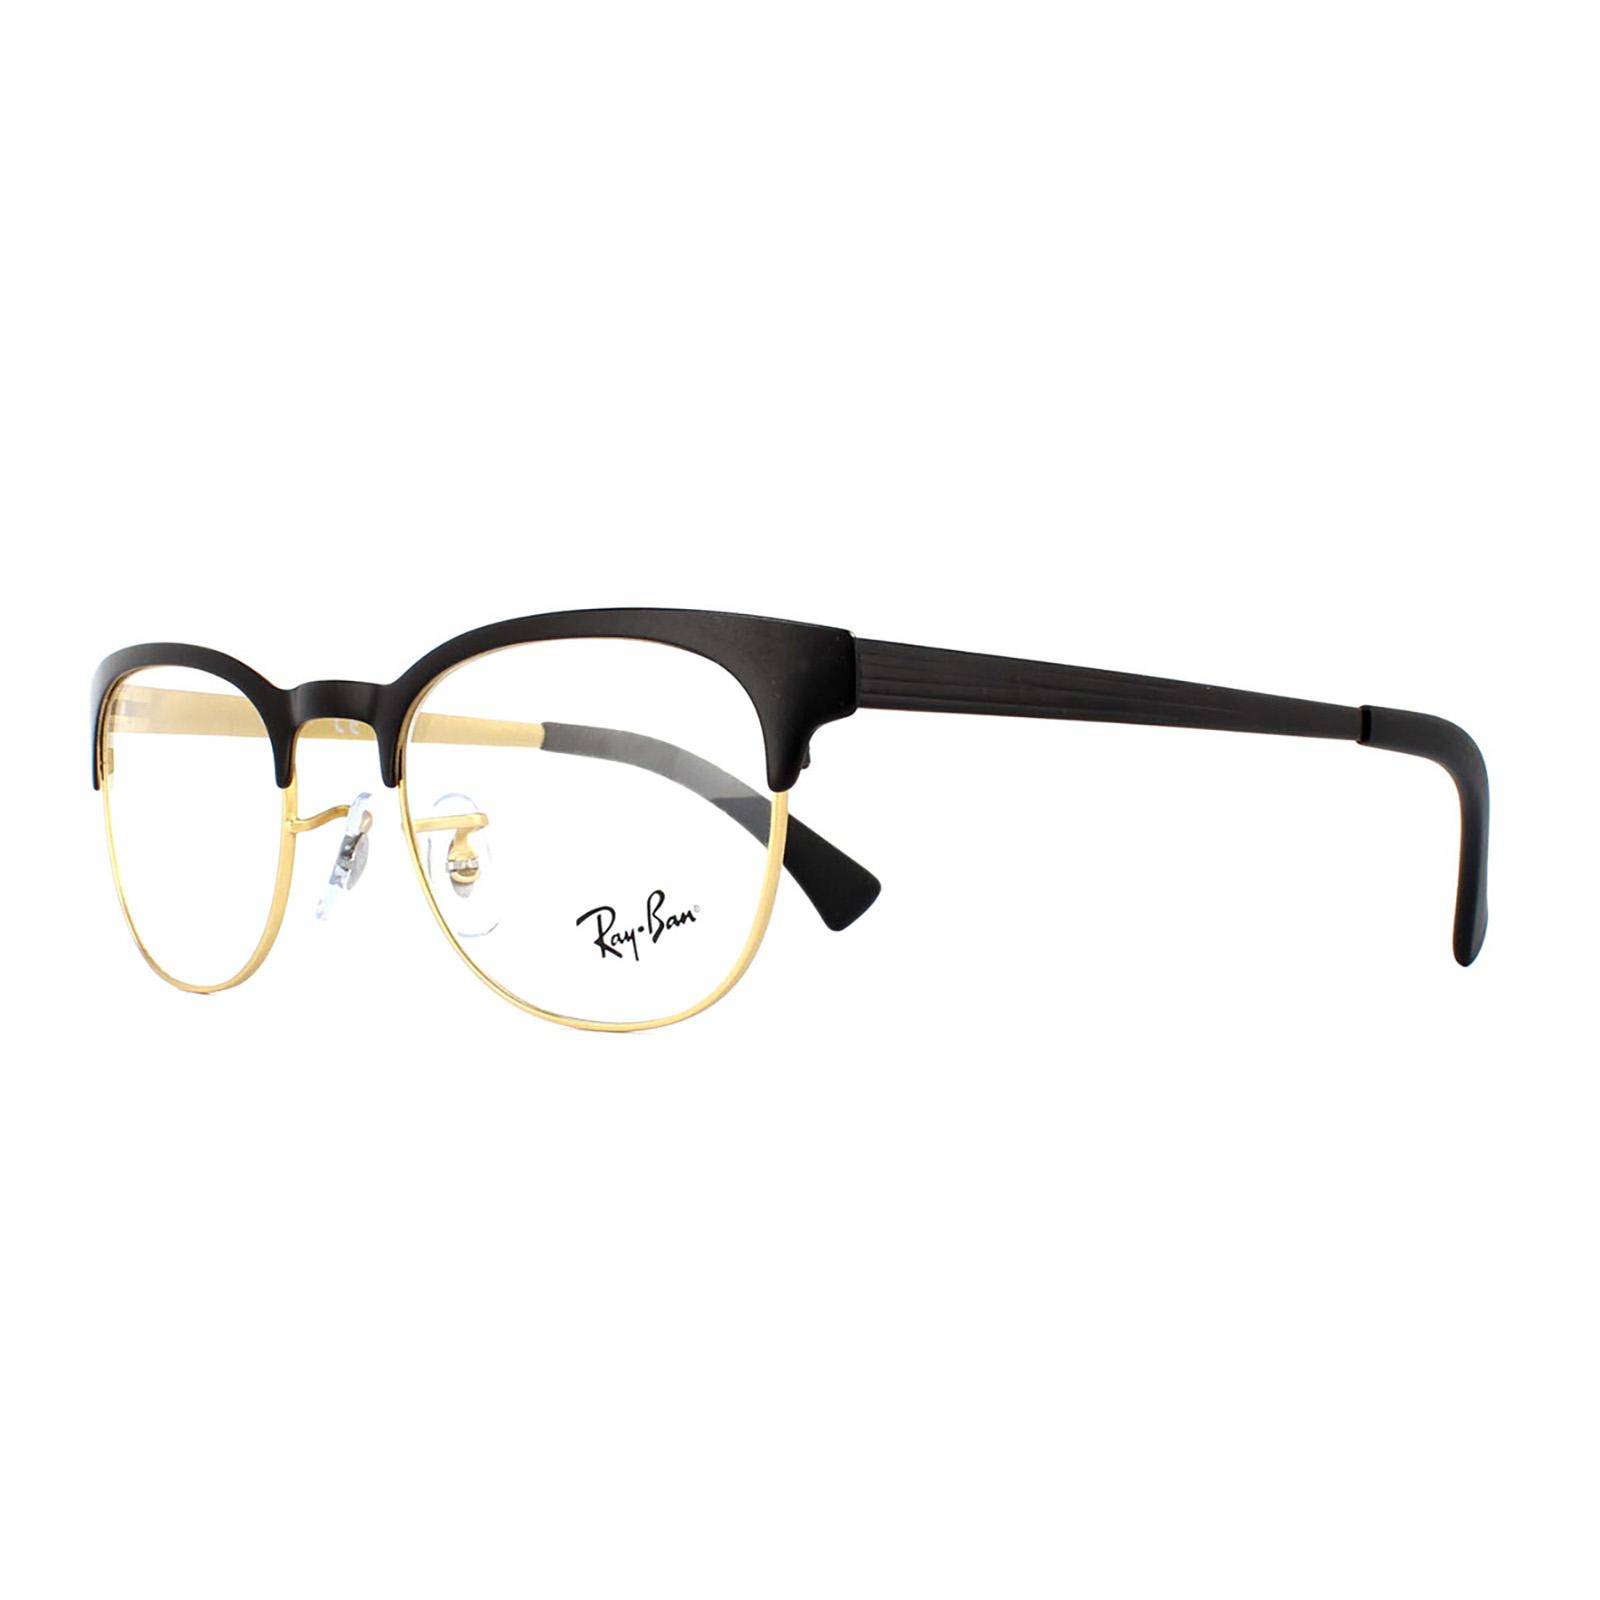 Ray-Ban Glasses Frames 6317 2833 Top Black On Matte Gold Mens Womens ...